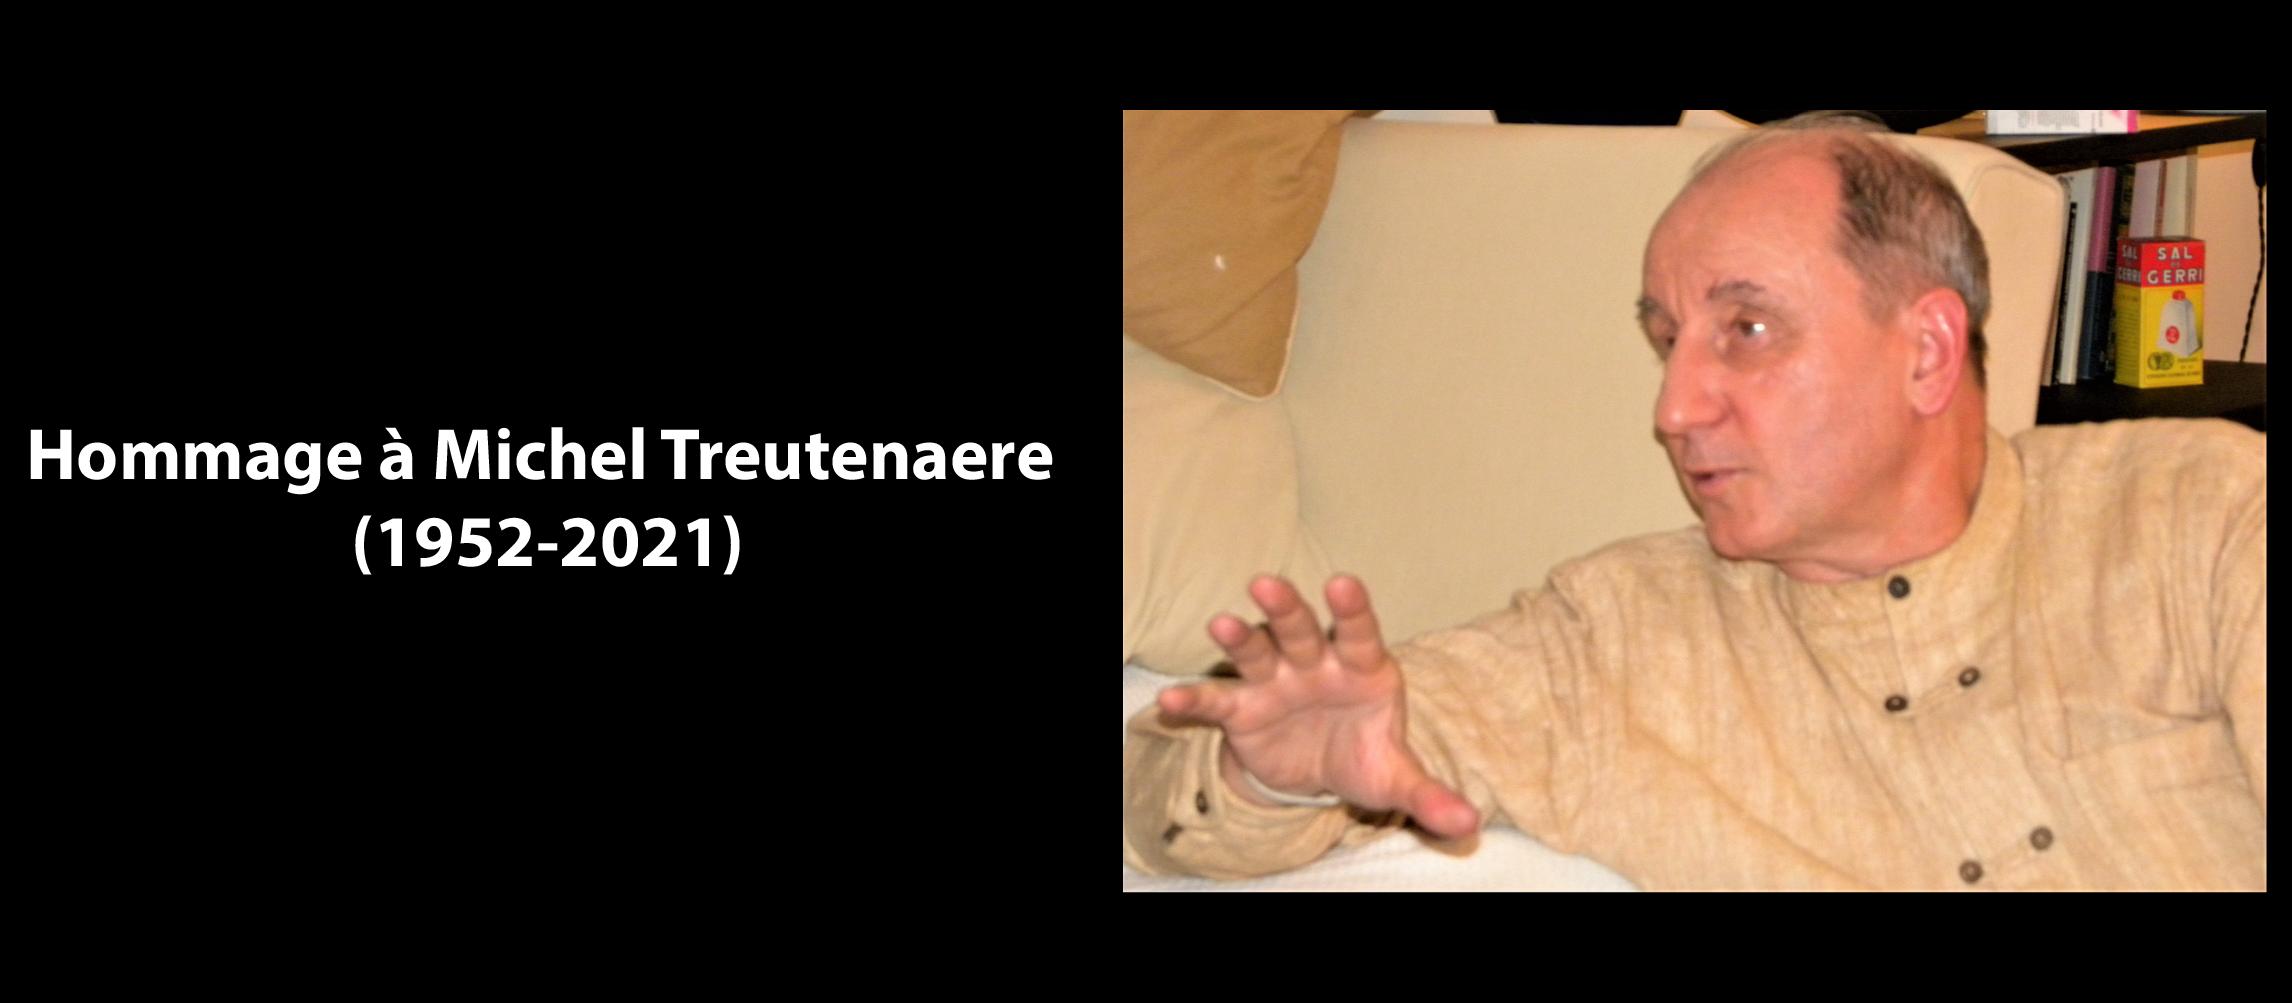 HOMMAGE À MICHEL TREUTENAERE (1952-2021)